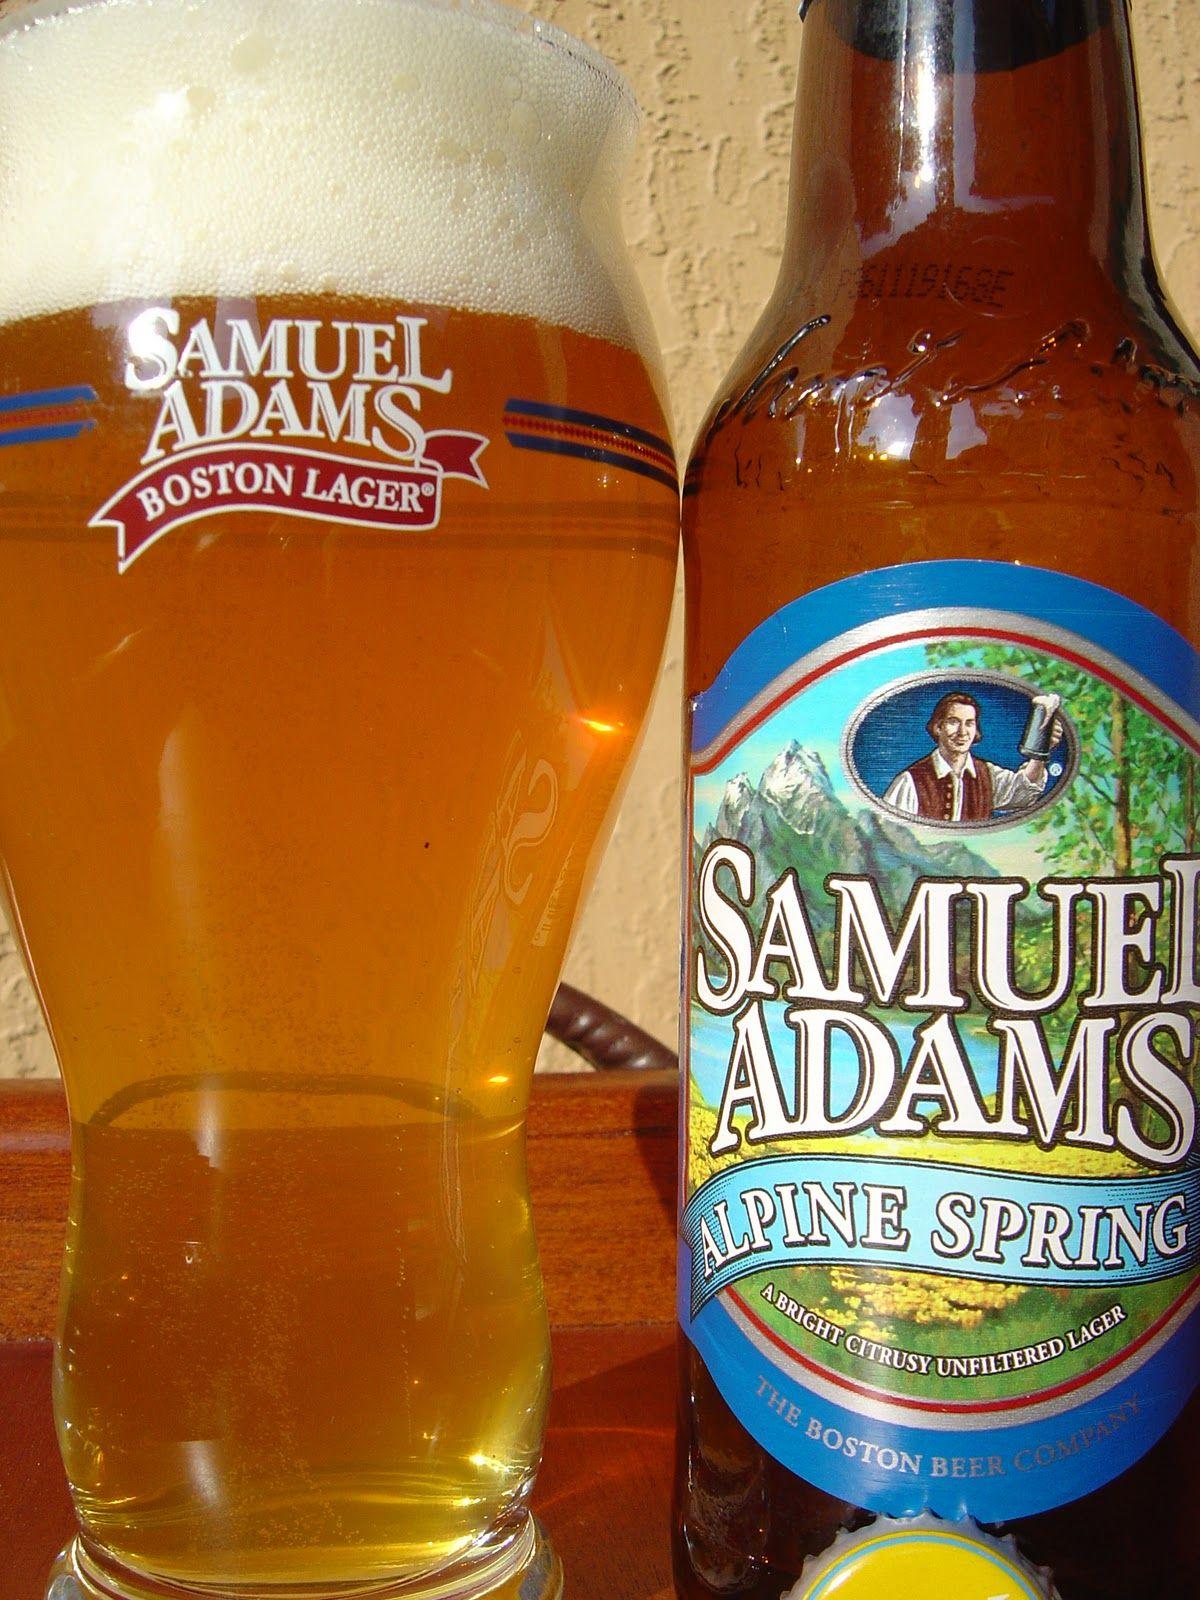 Samuel Adams Alpine Spring Apparently The Boston Beer Company Is